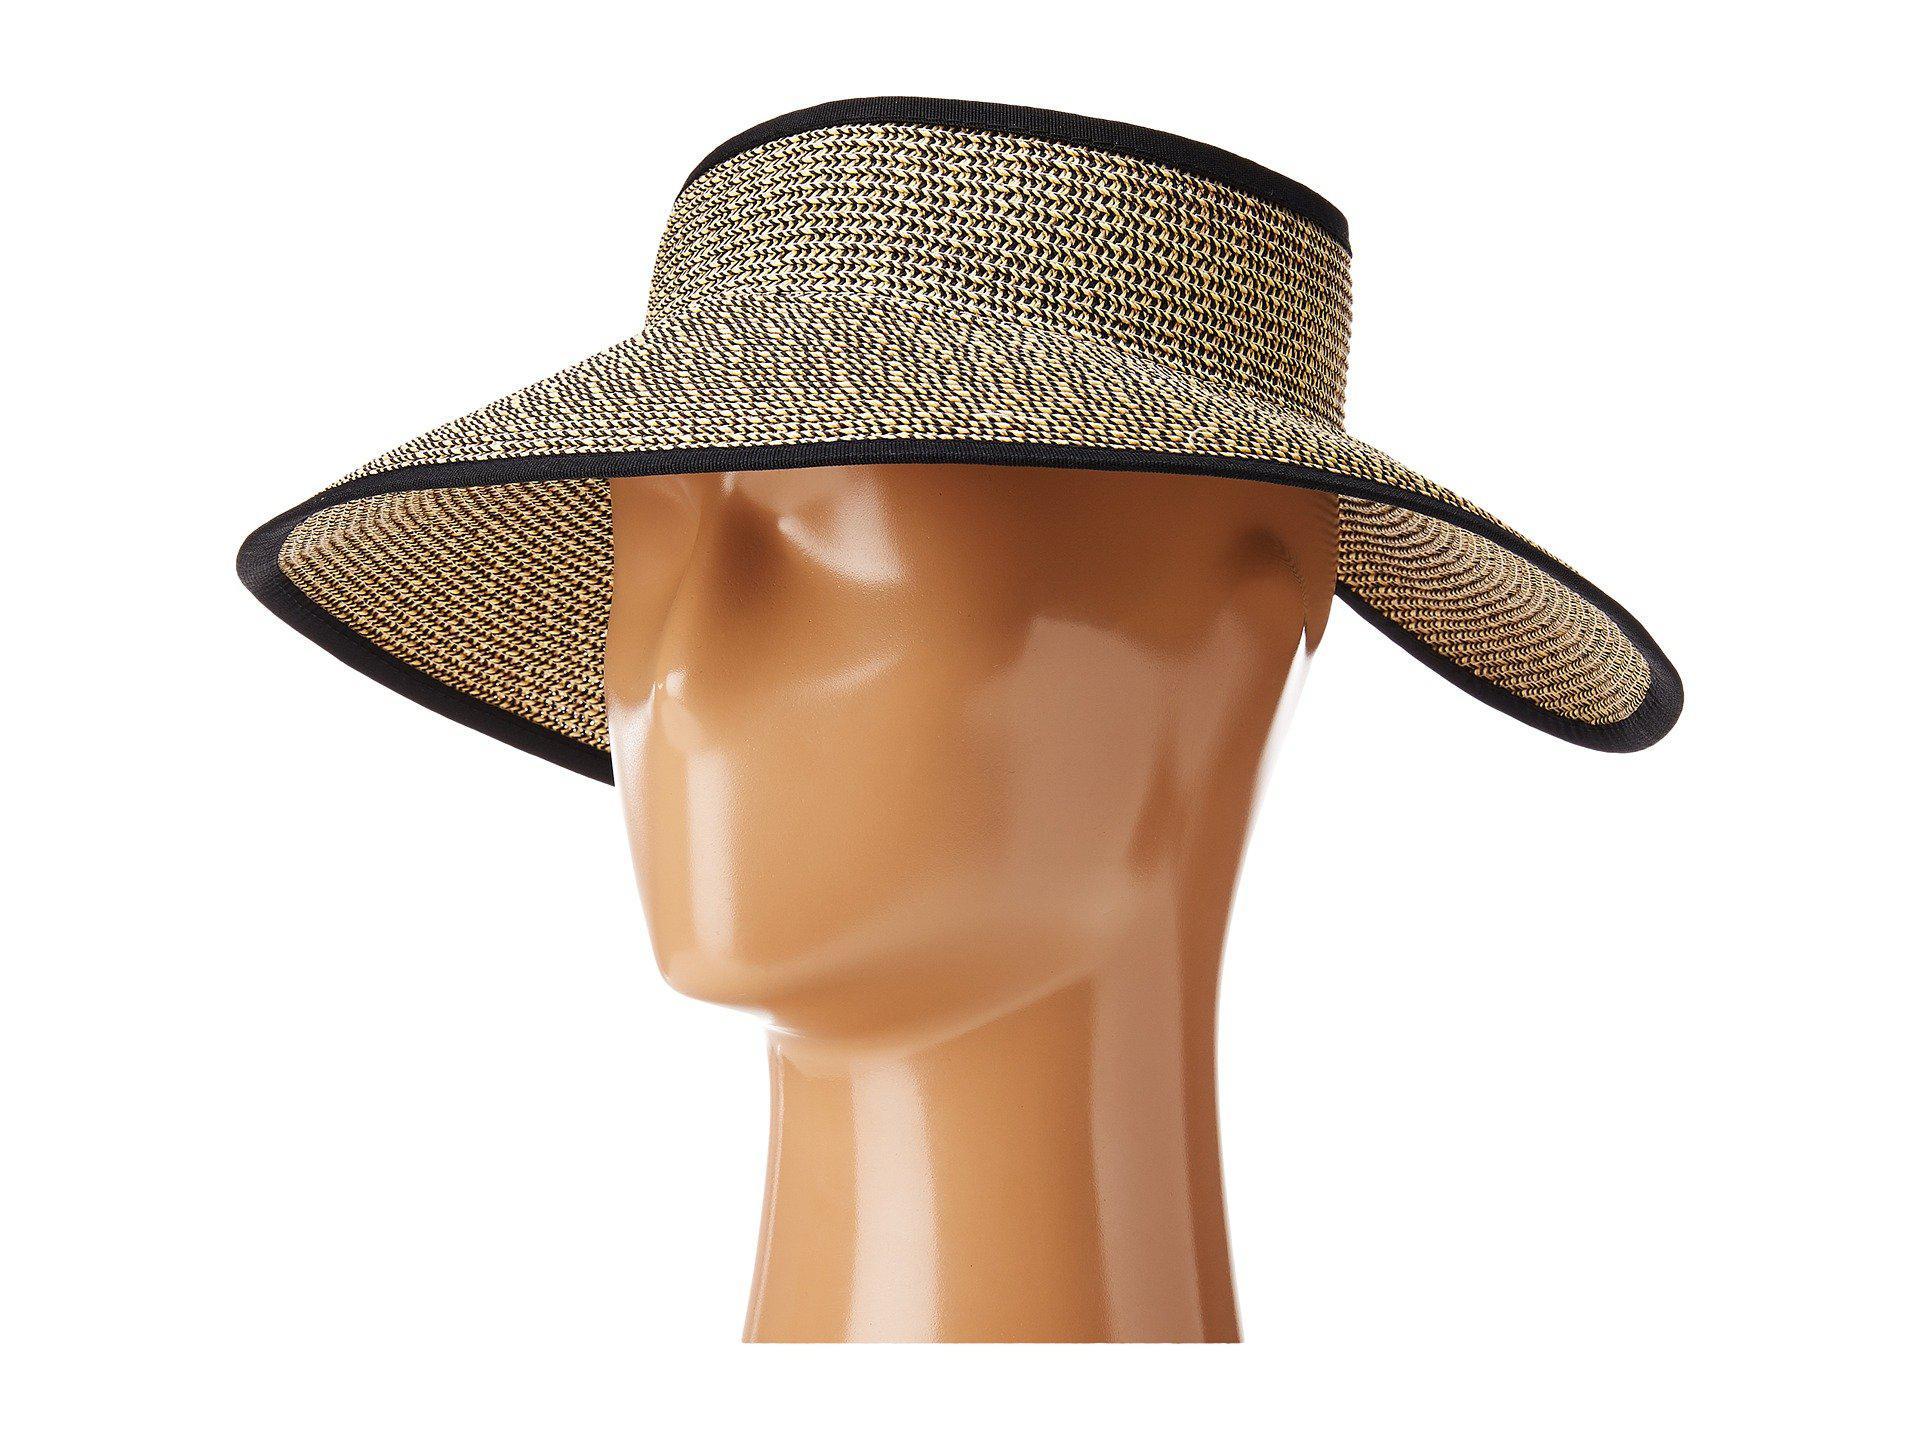 Lyst - San Diego Hat Company Ubv002 Sun Hat Visor (multi Brown ... 8fa99b95536